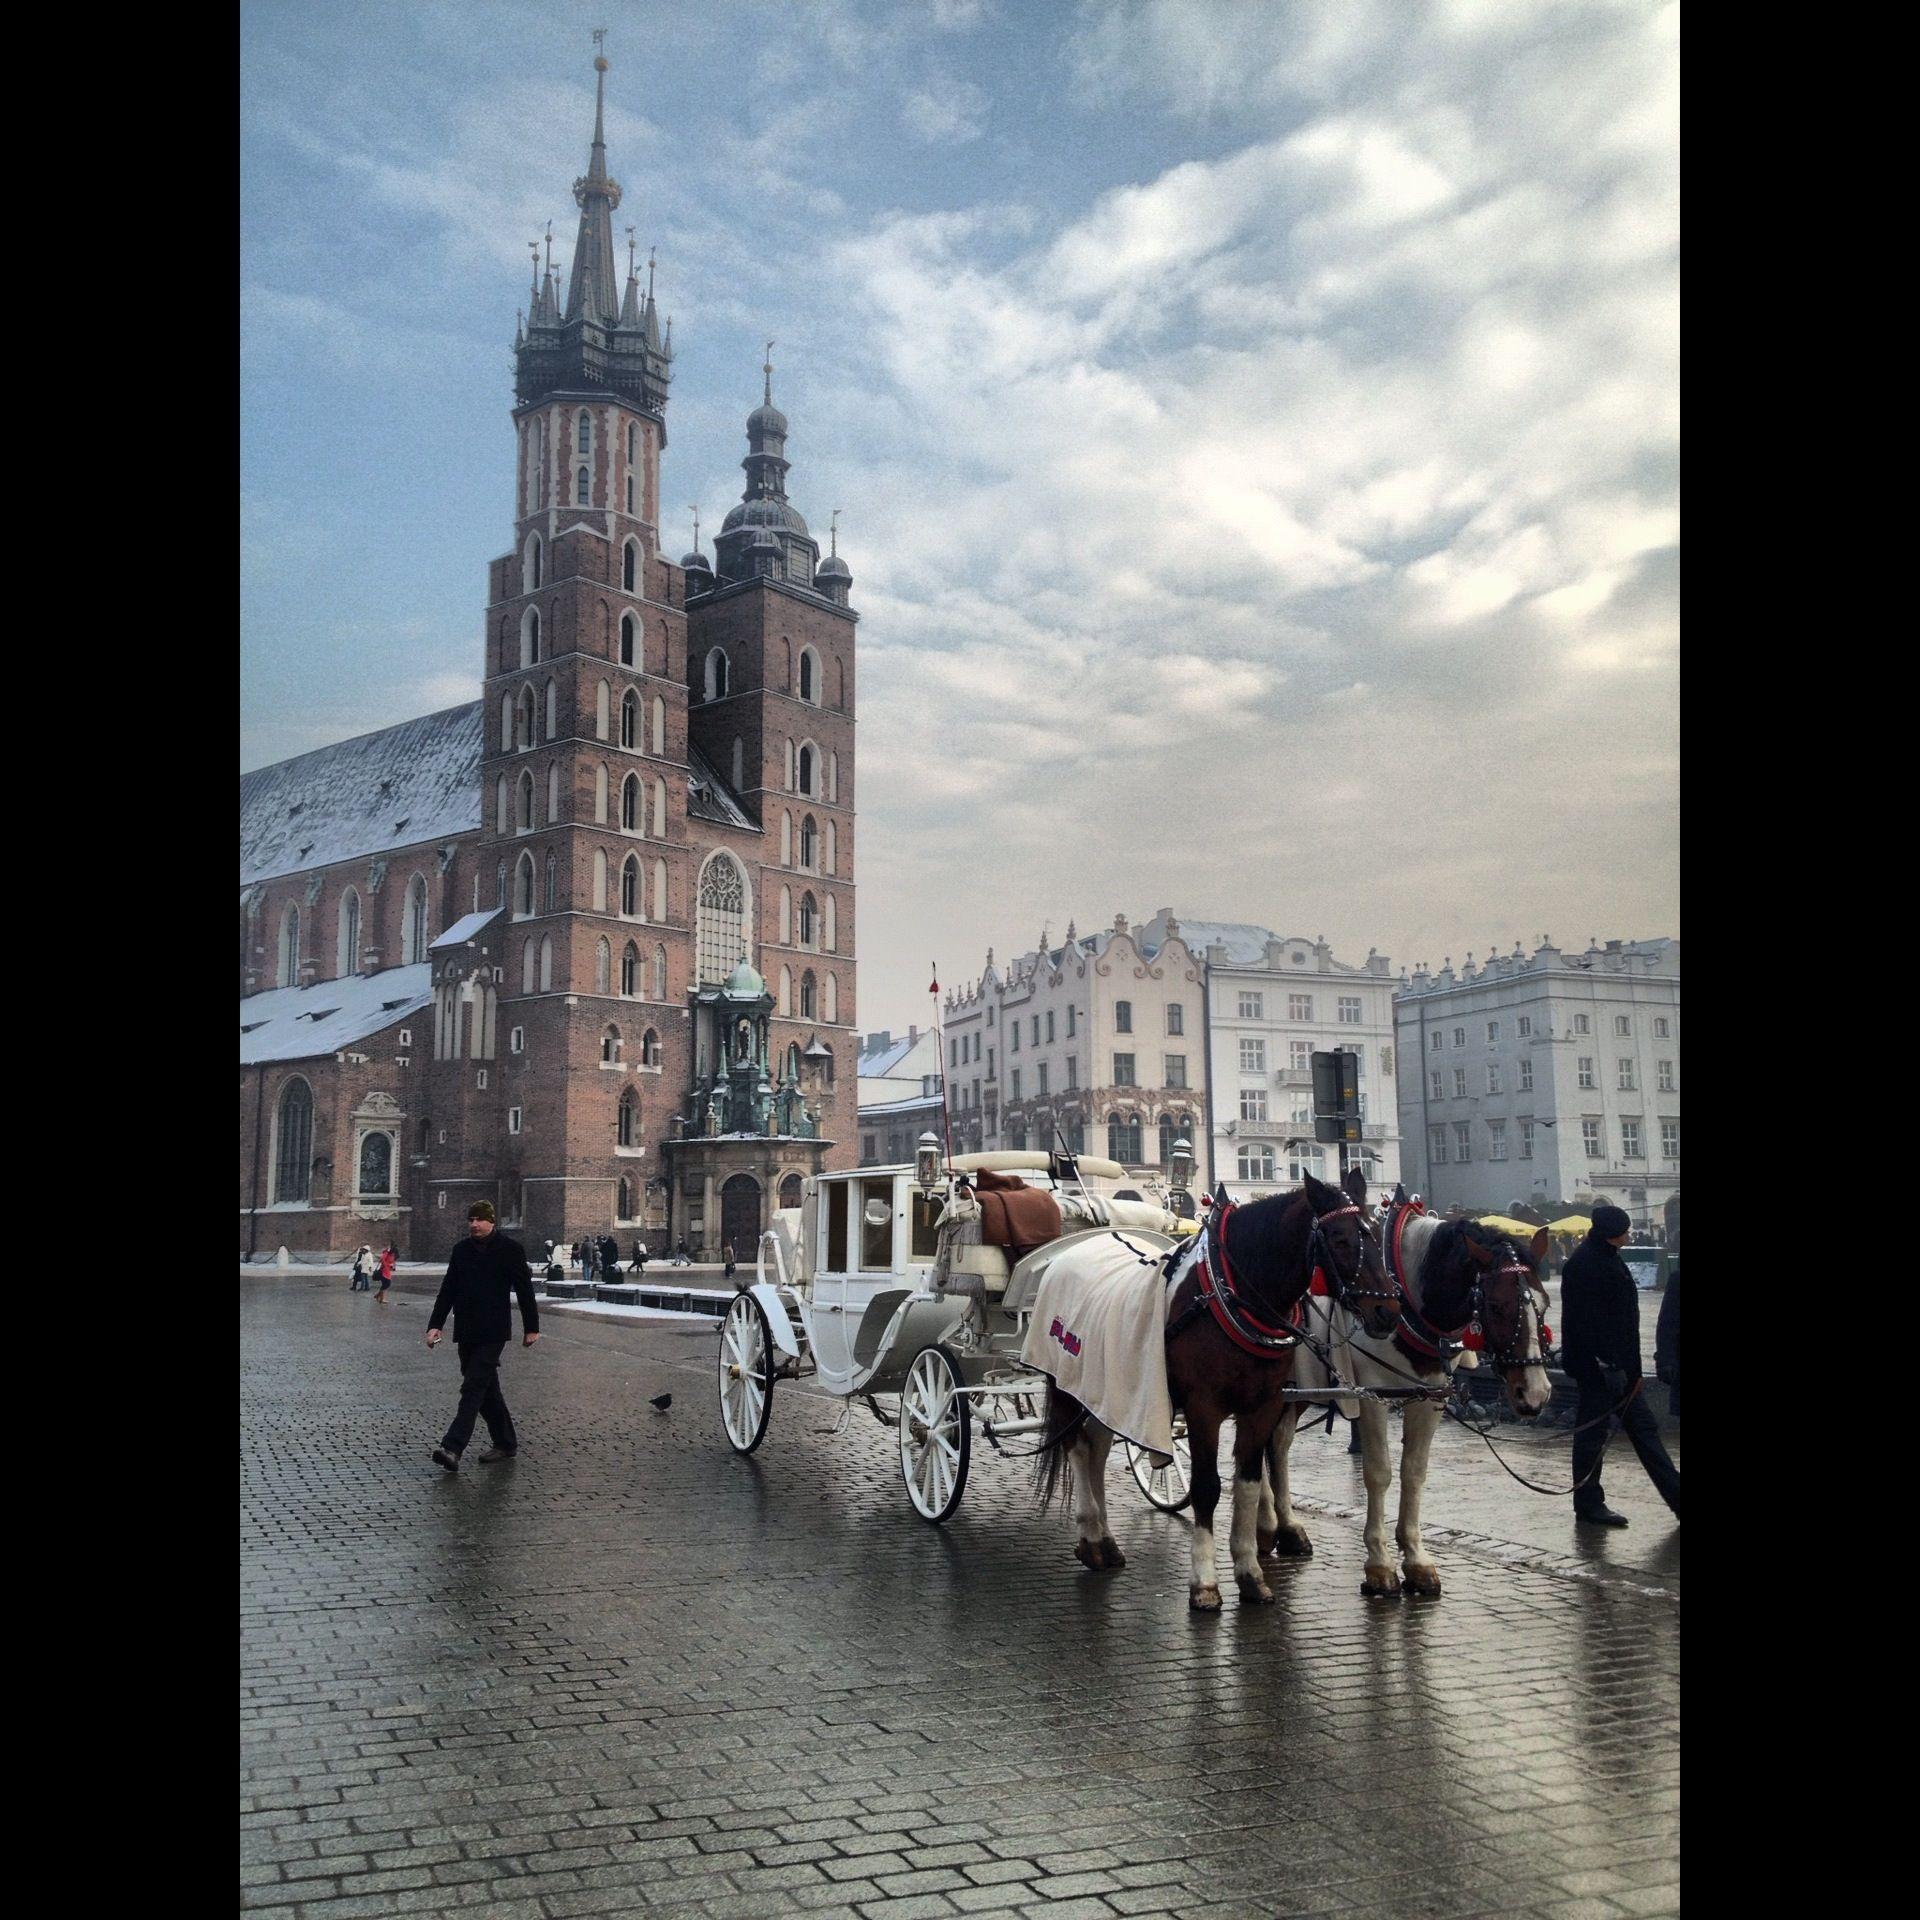 Krakow, Poland. Winter 2012.